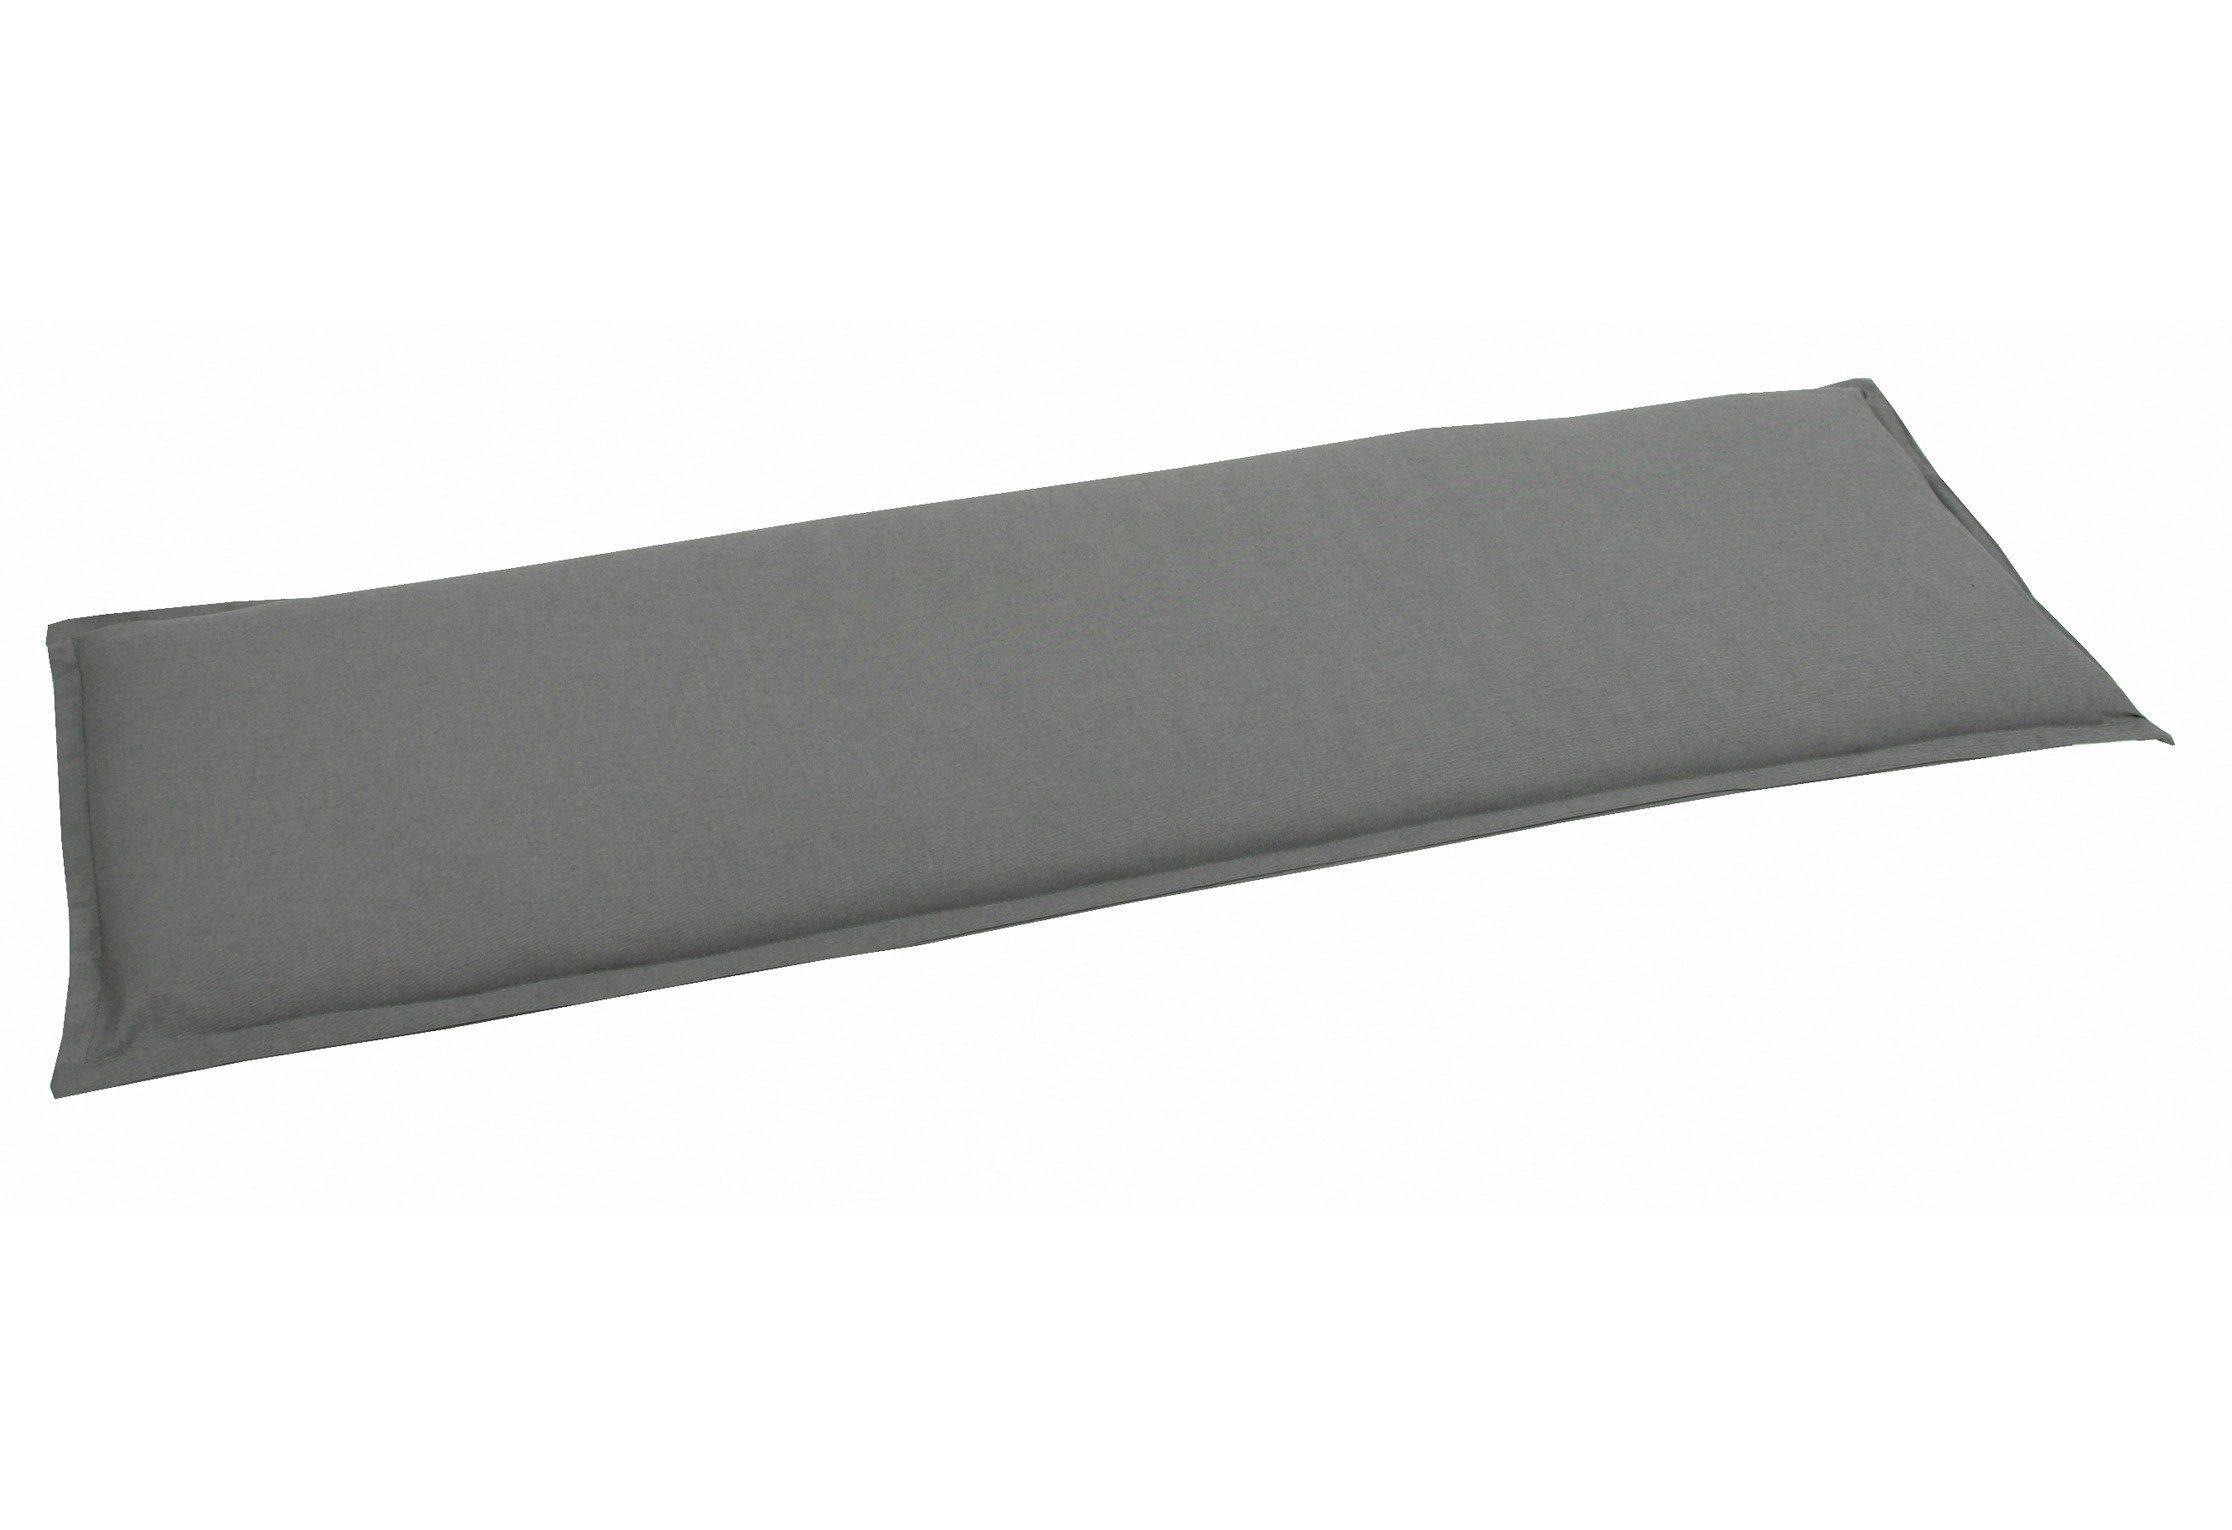 GO-DE Bankauflage, (L/B): ca. 142x48 cm